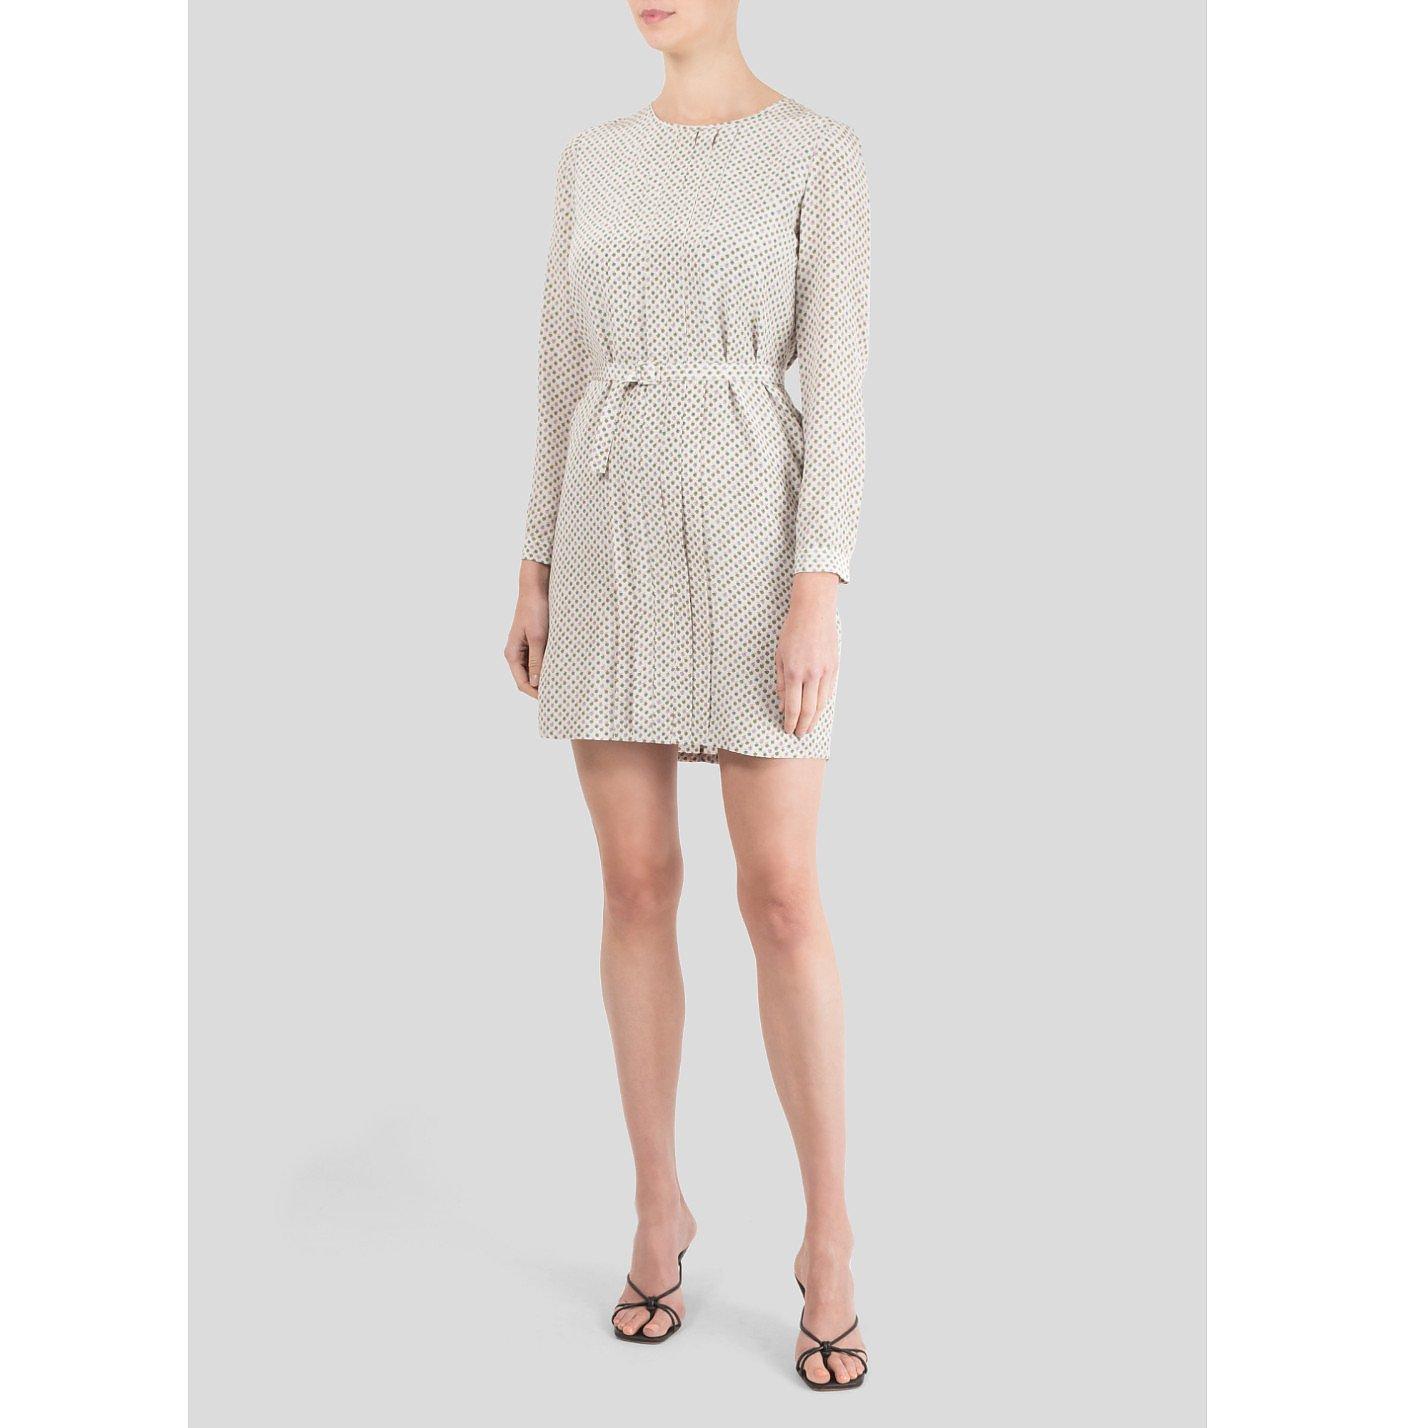 A.P.C. Apple Print Silk Dress